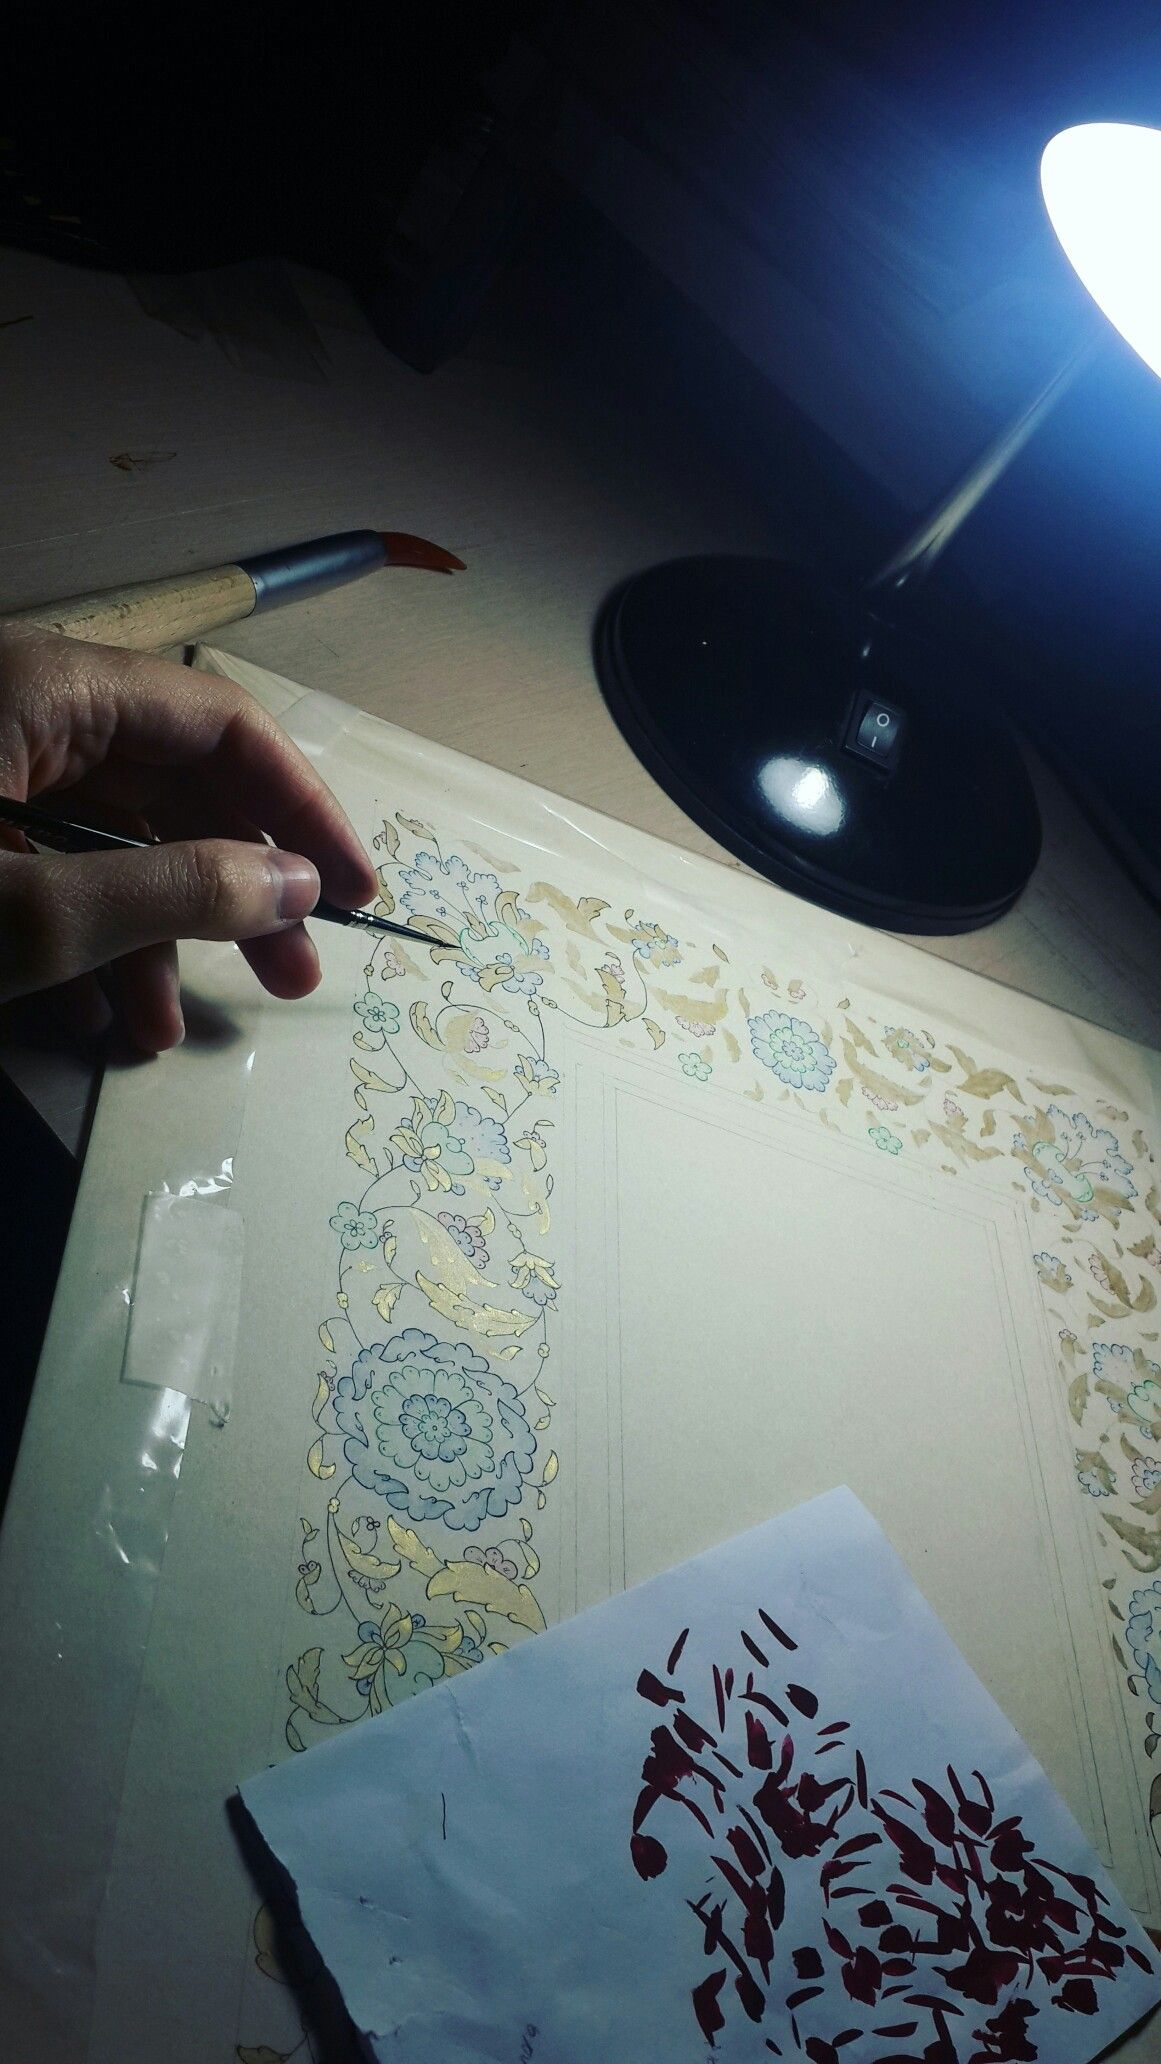 Pin by Rabia Saricam on My art Art, Decor, Home decor